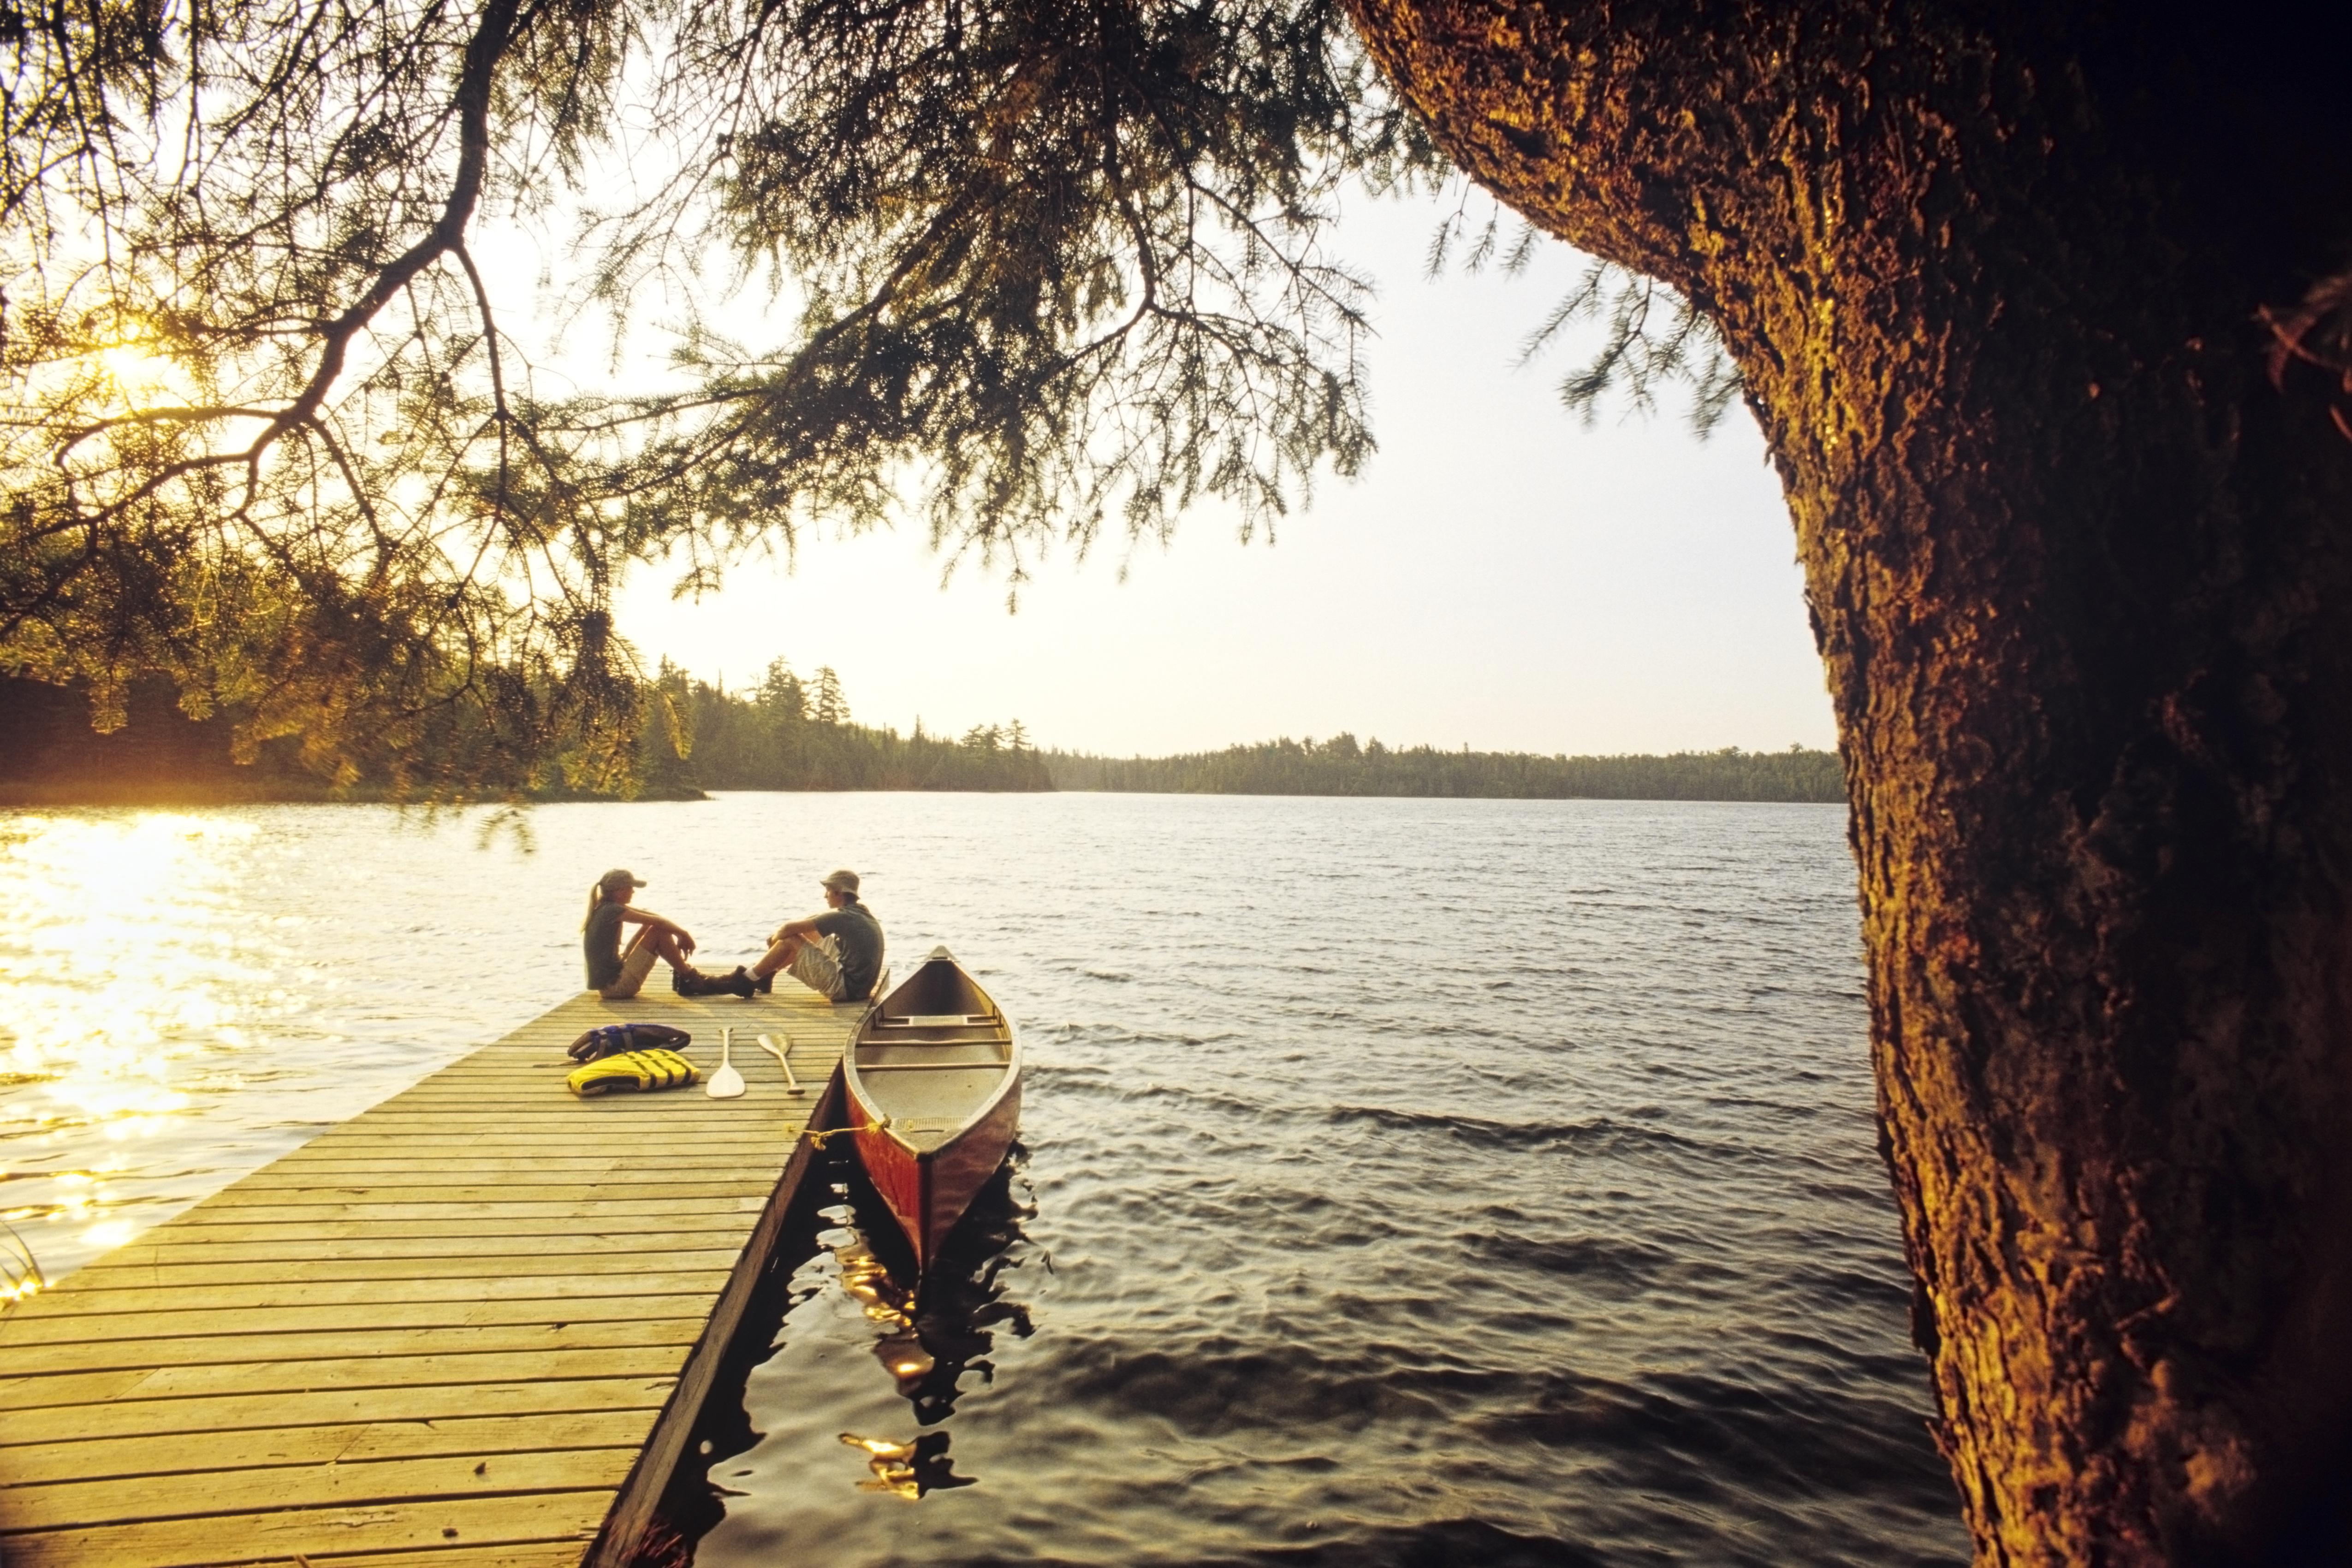 Lyons Lake, Whiteshell Provincial Park, Manitoba, Canada.